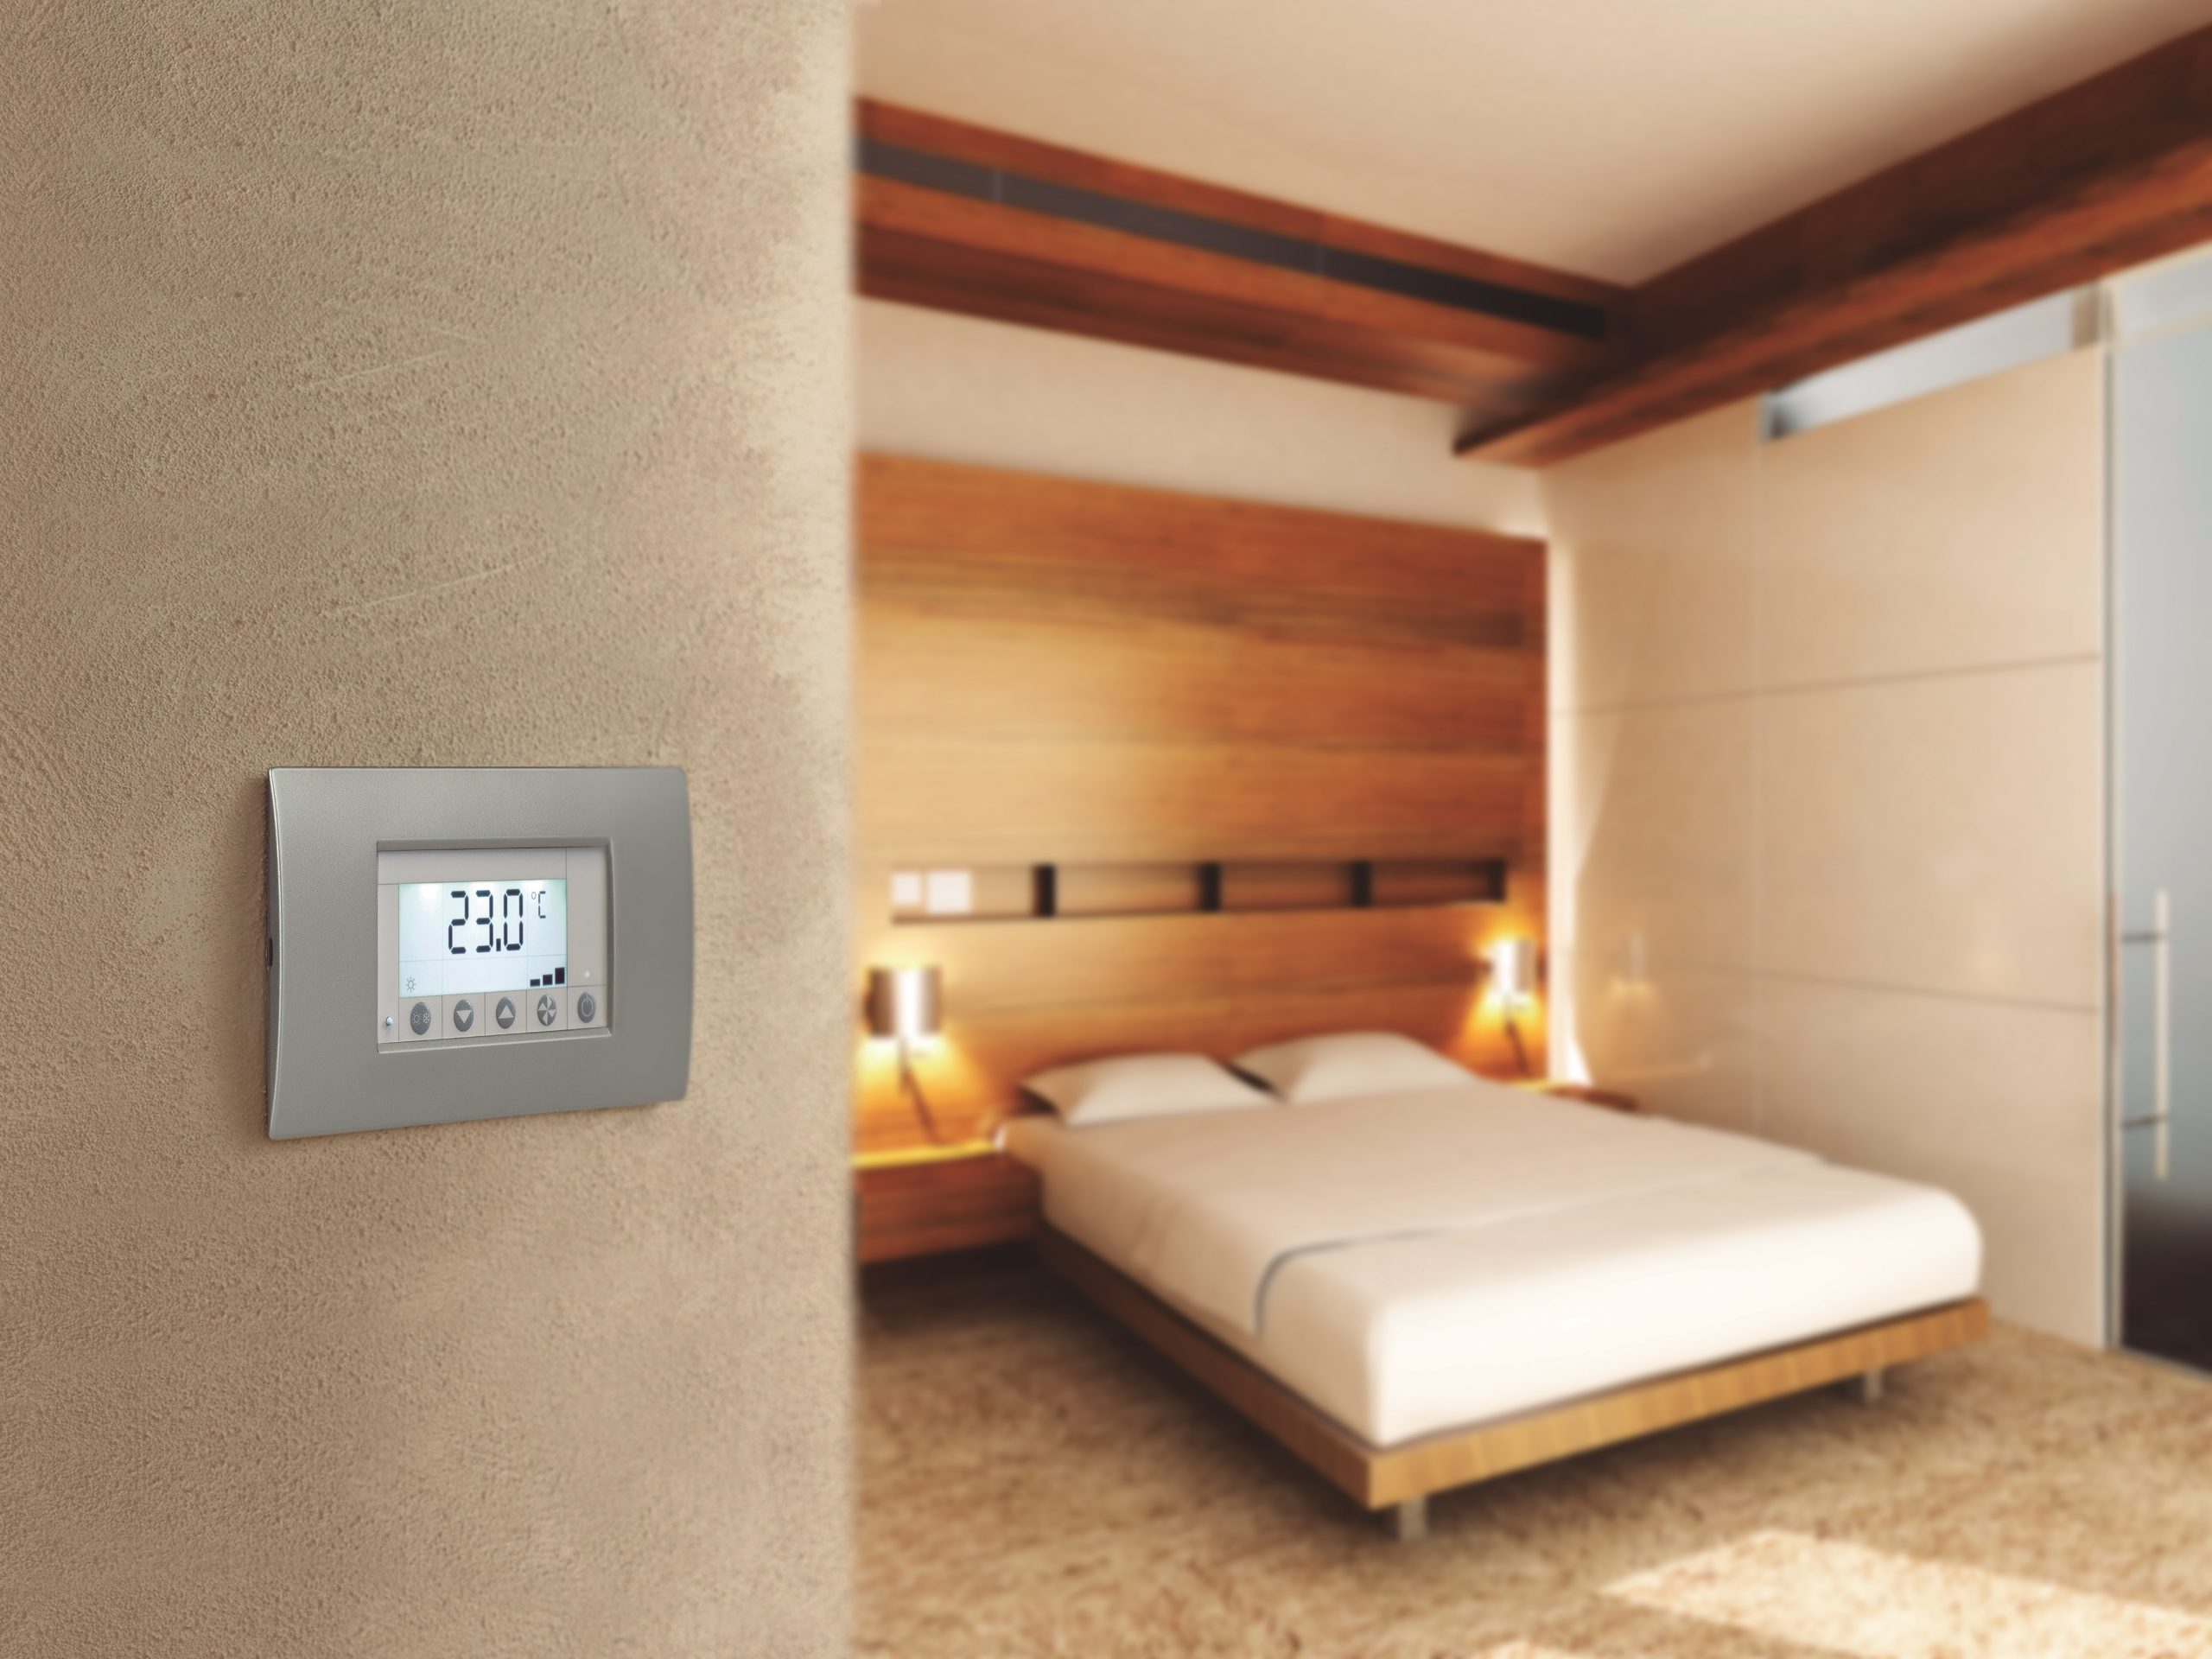 Tipp: Wärmepumpe – 2 Speicher System bei Heizkörper